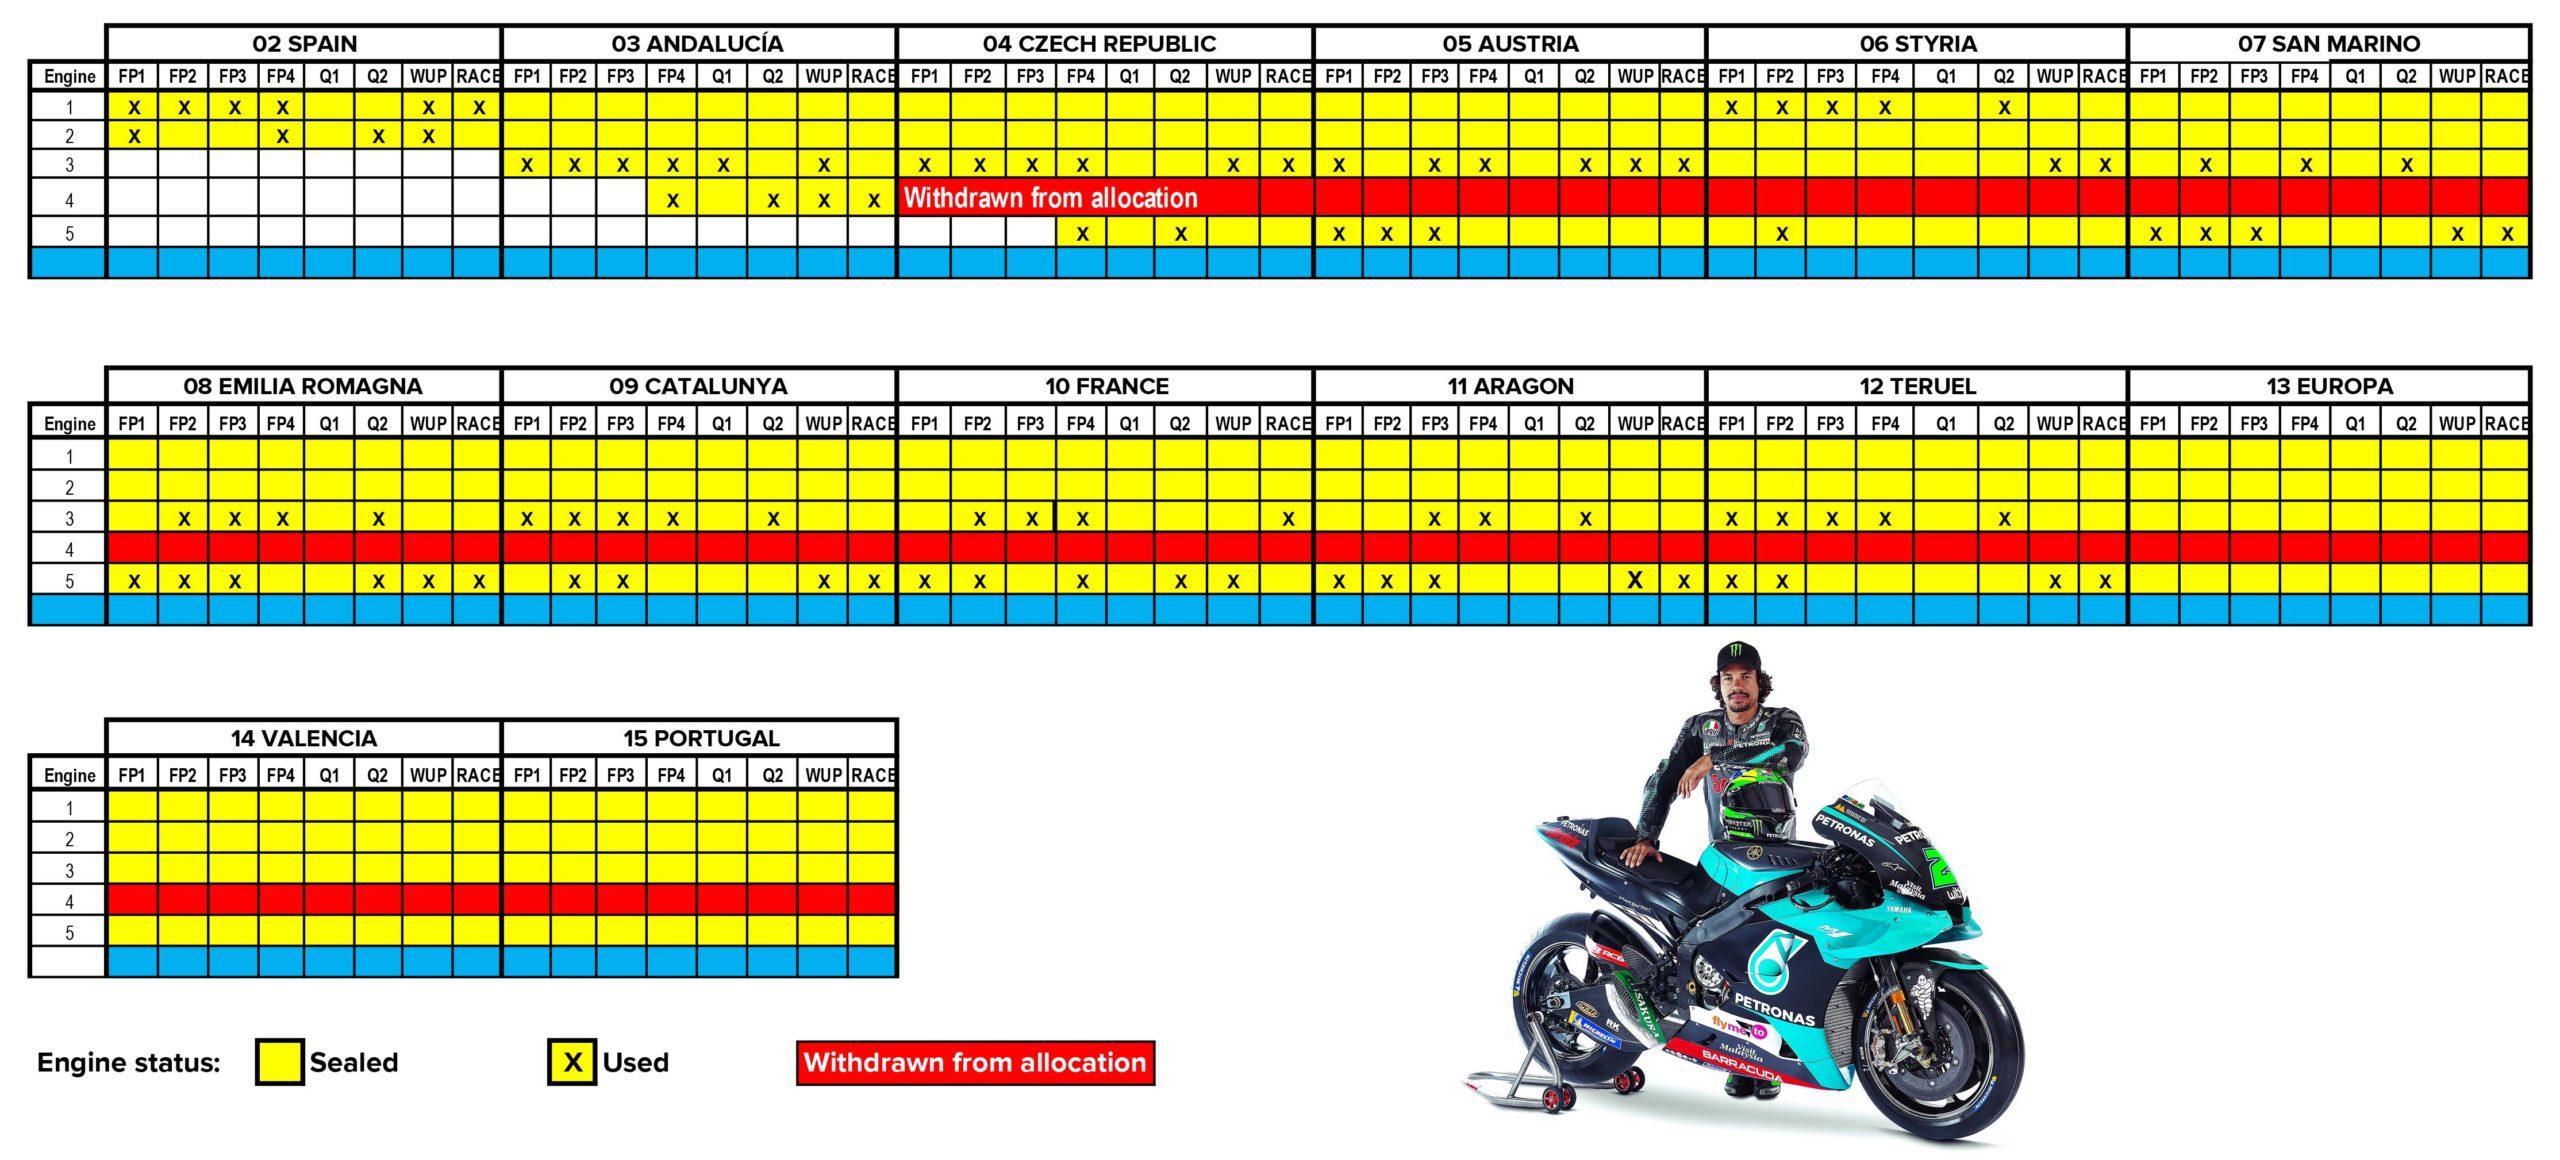 Franco Morbidelli November 2020 MotoGP engine allocation